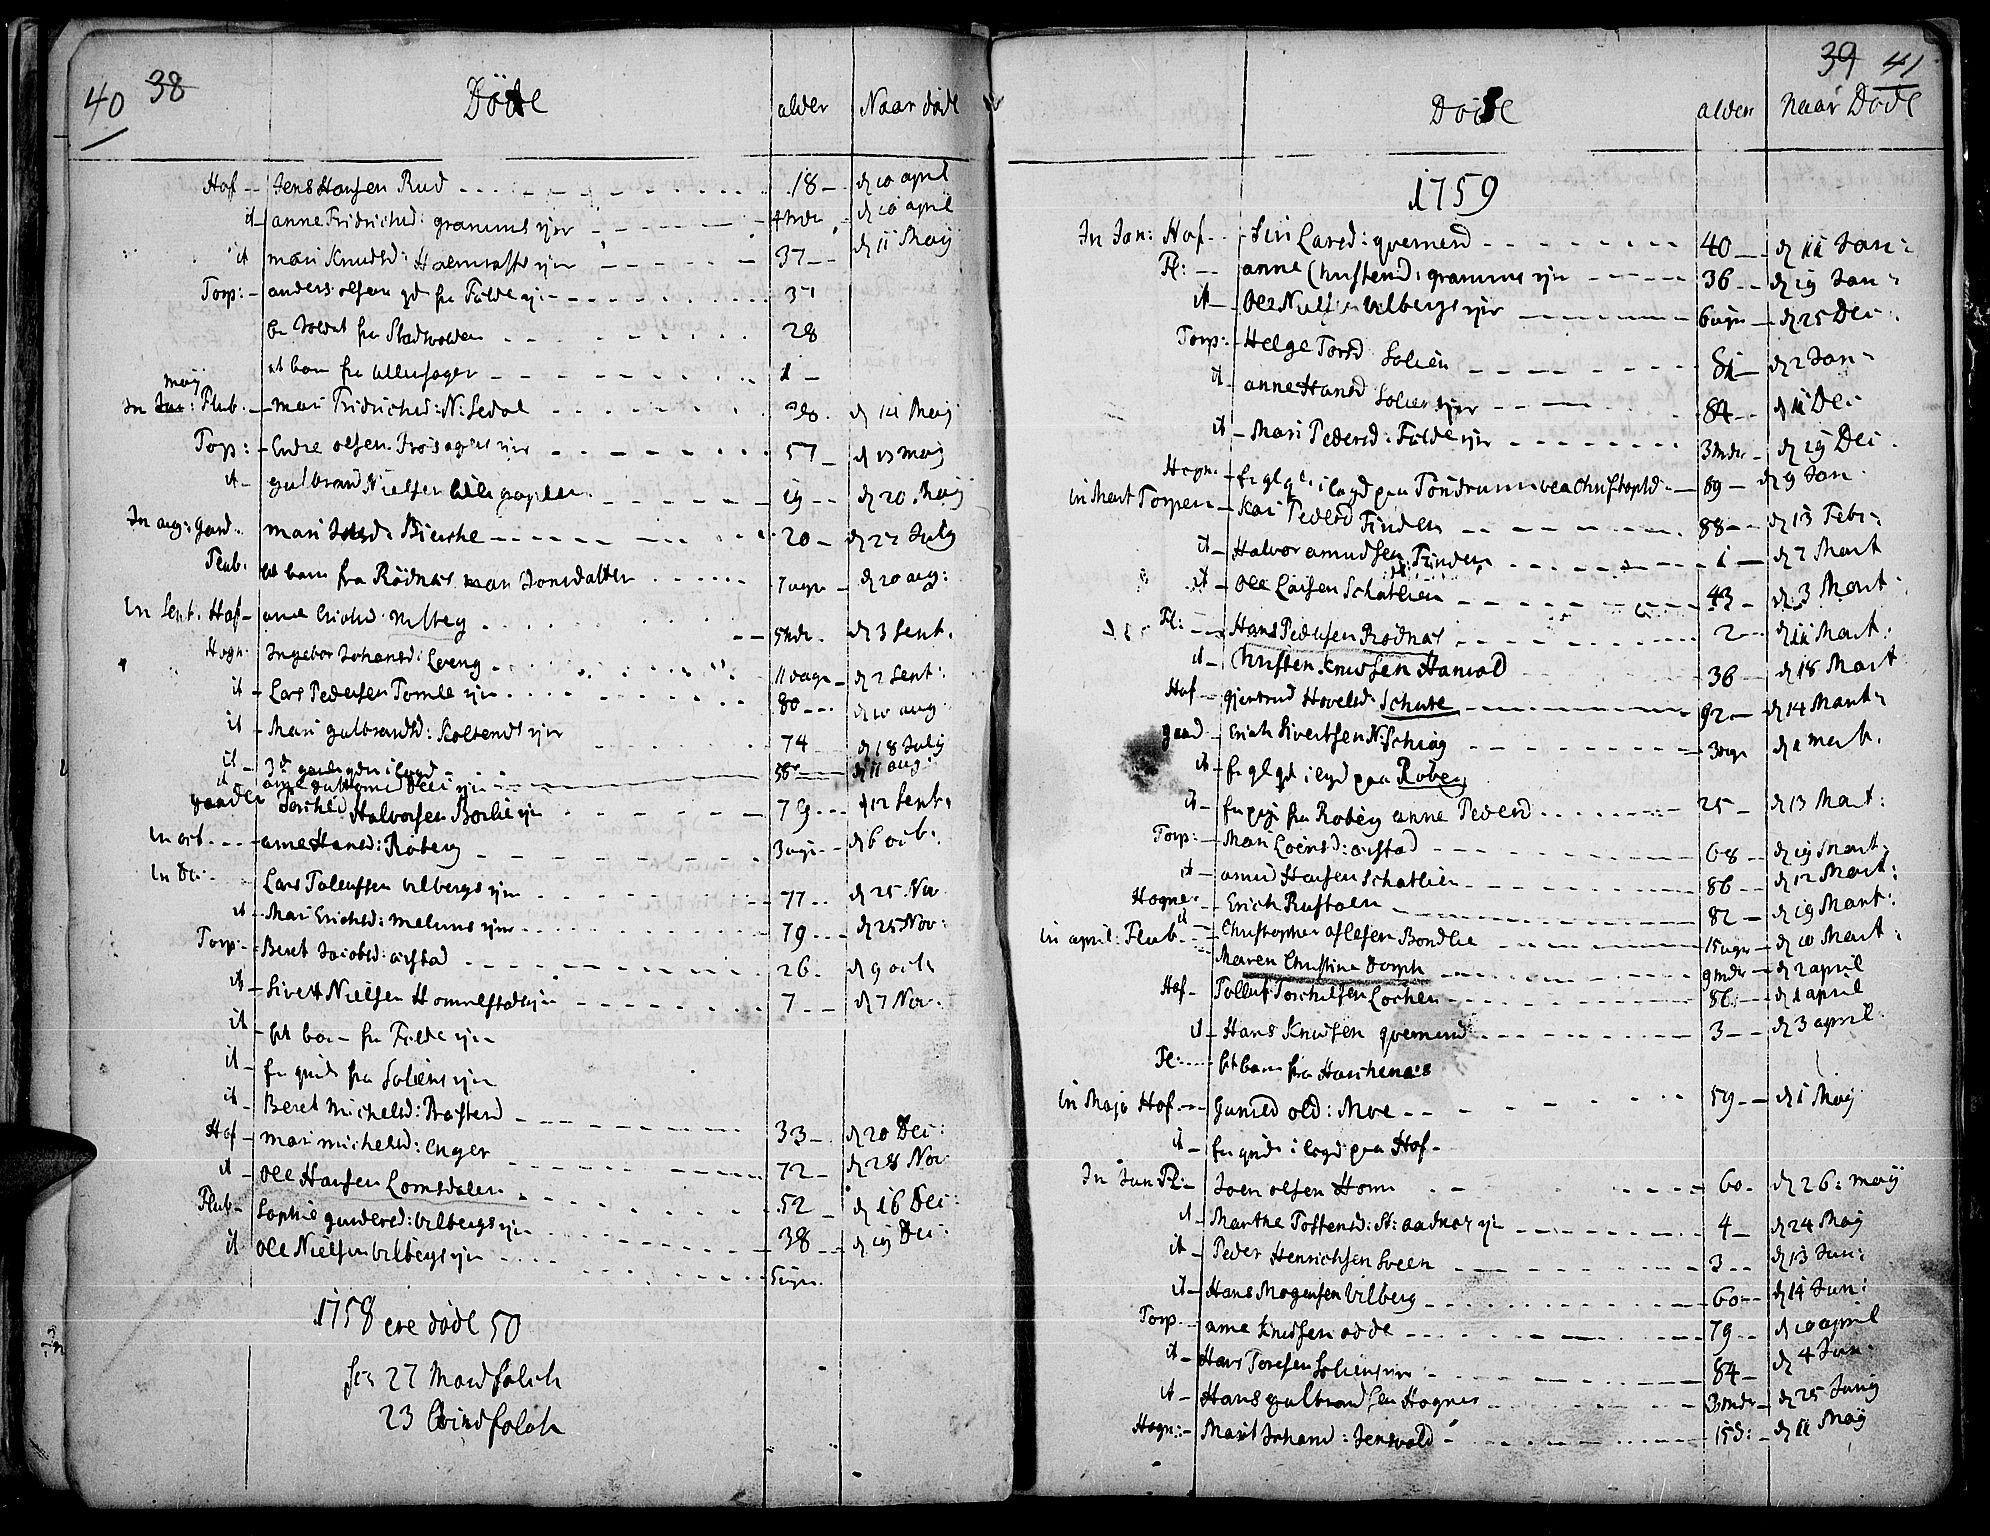 SAH, Land prestekontor, Ministerialbok nr. 4, 1733-1764, s. 40-41